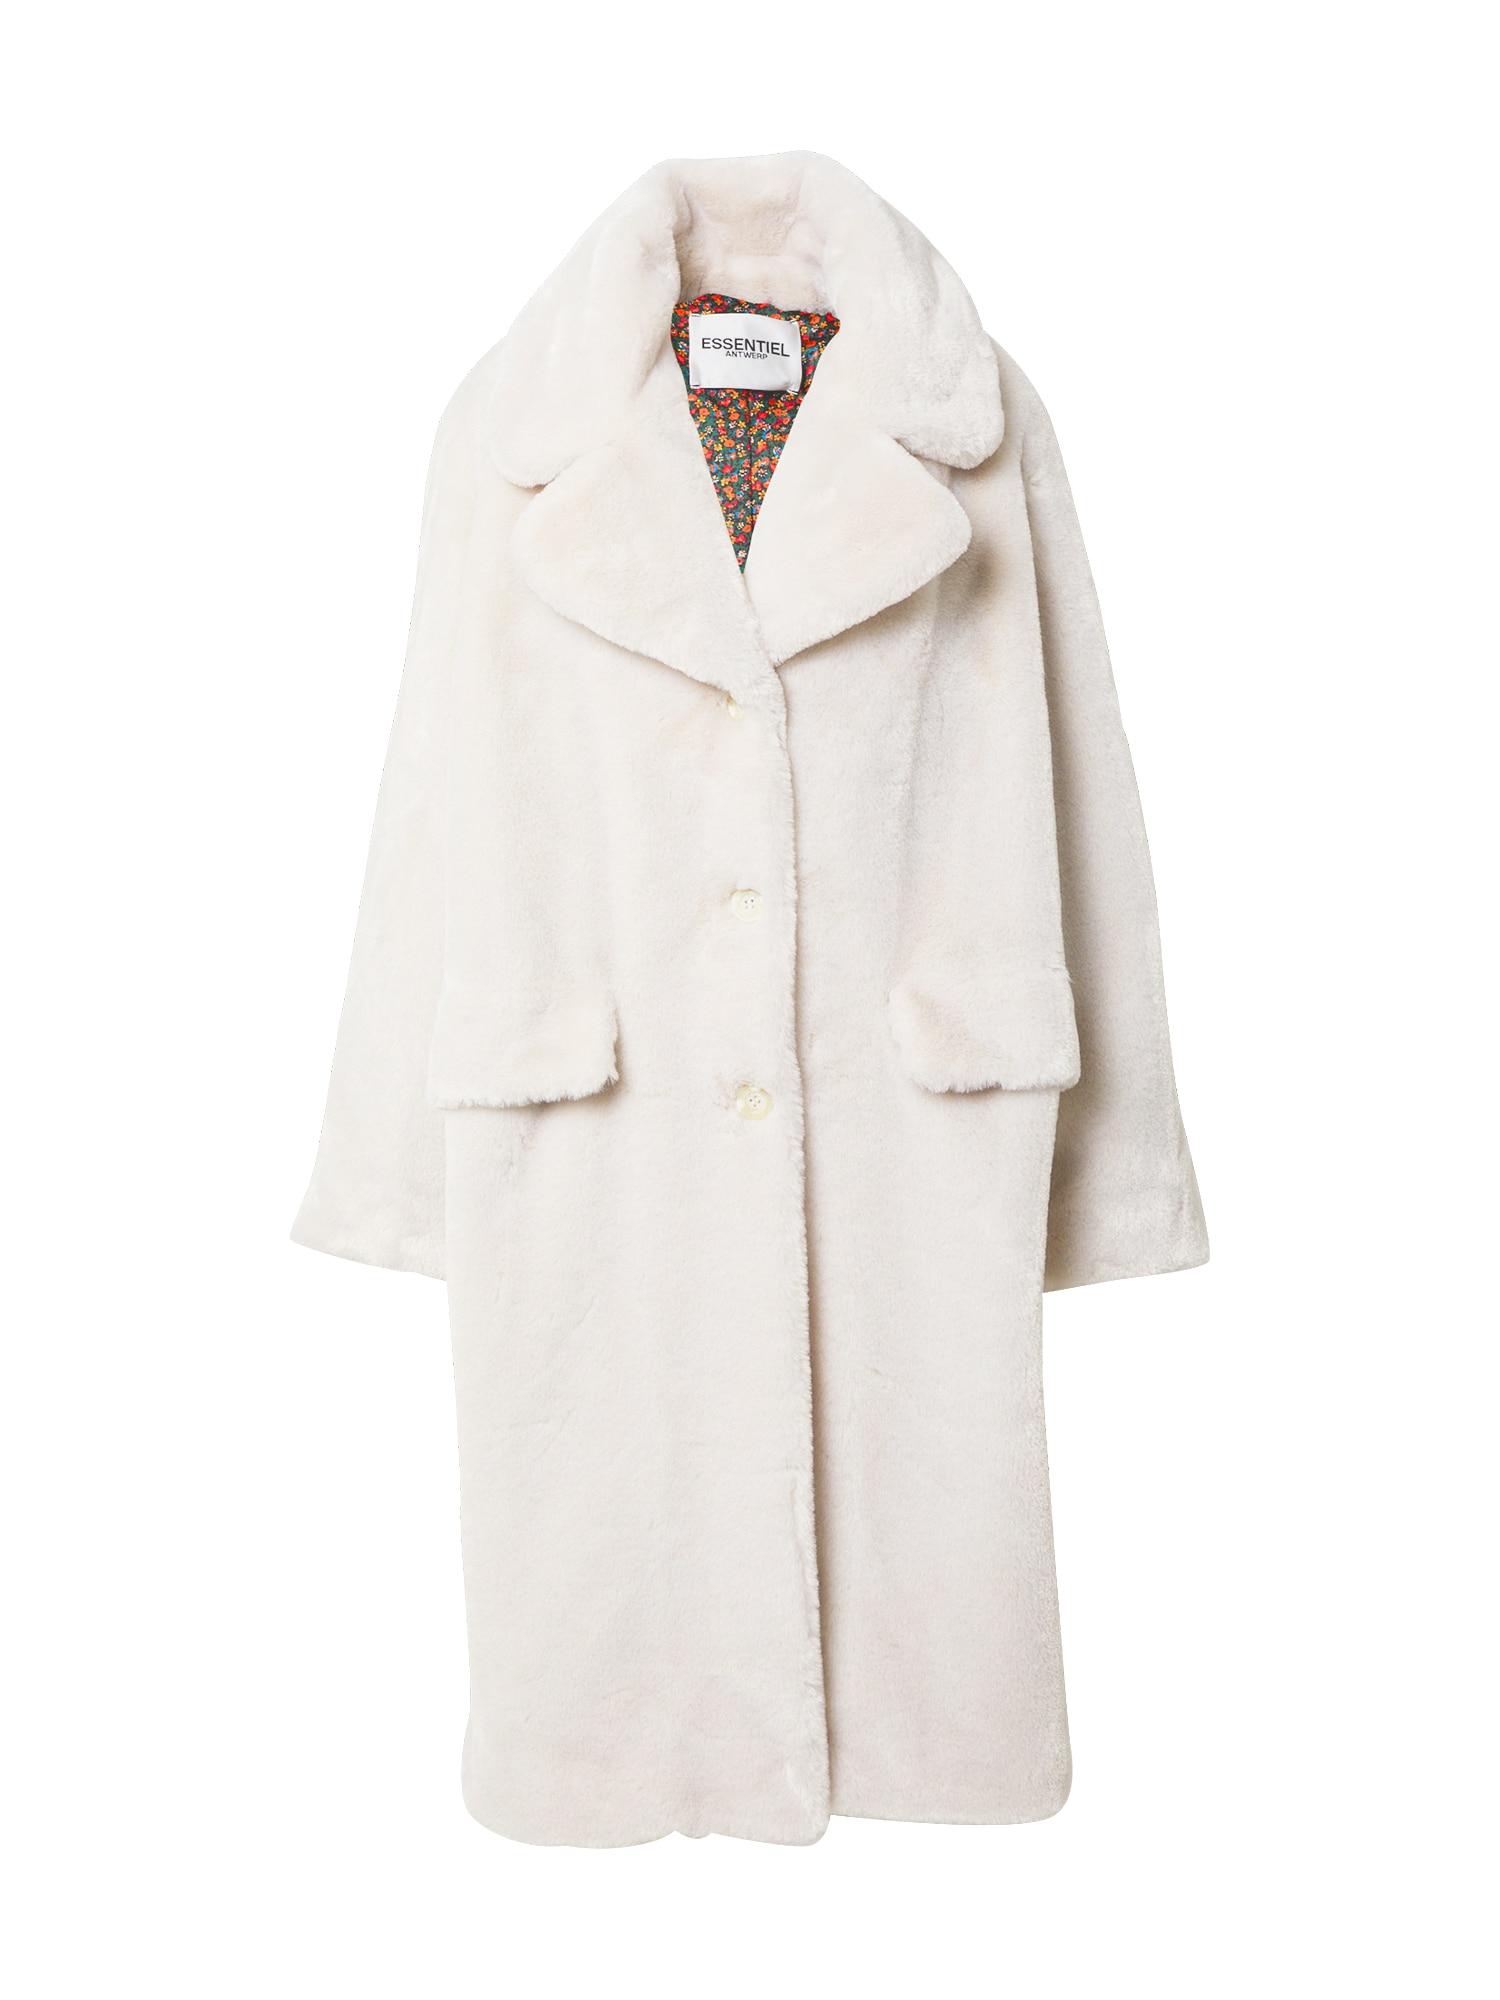 Essentiel Antwerp Rudeninis-žieminis paltas balta